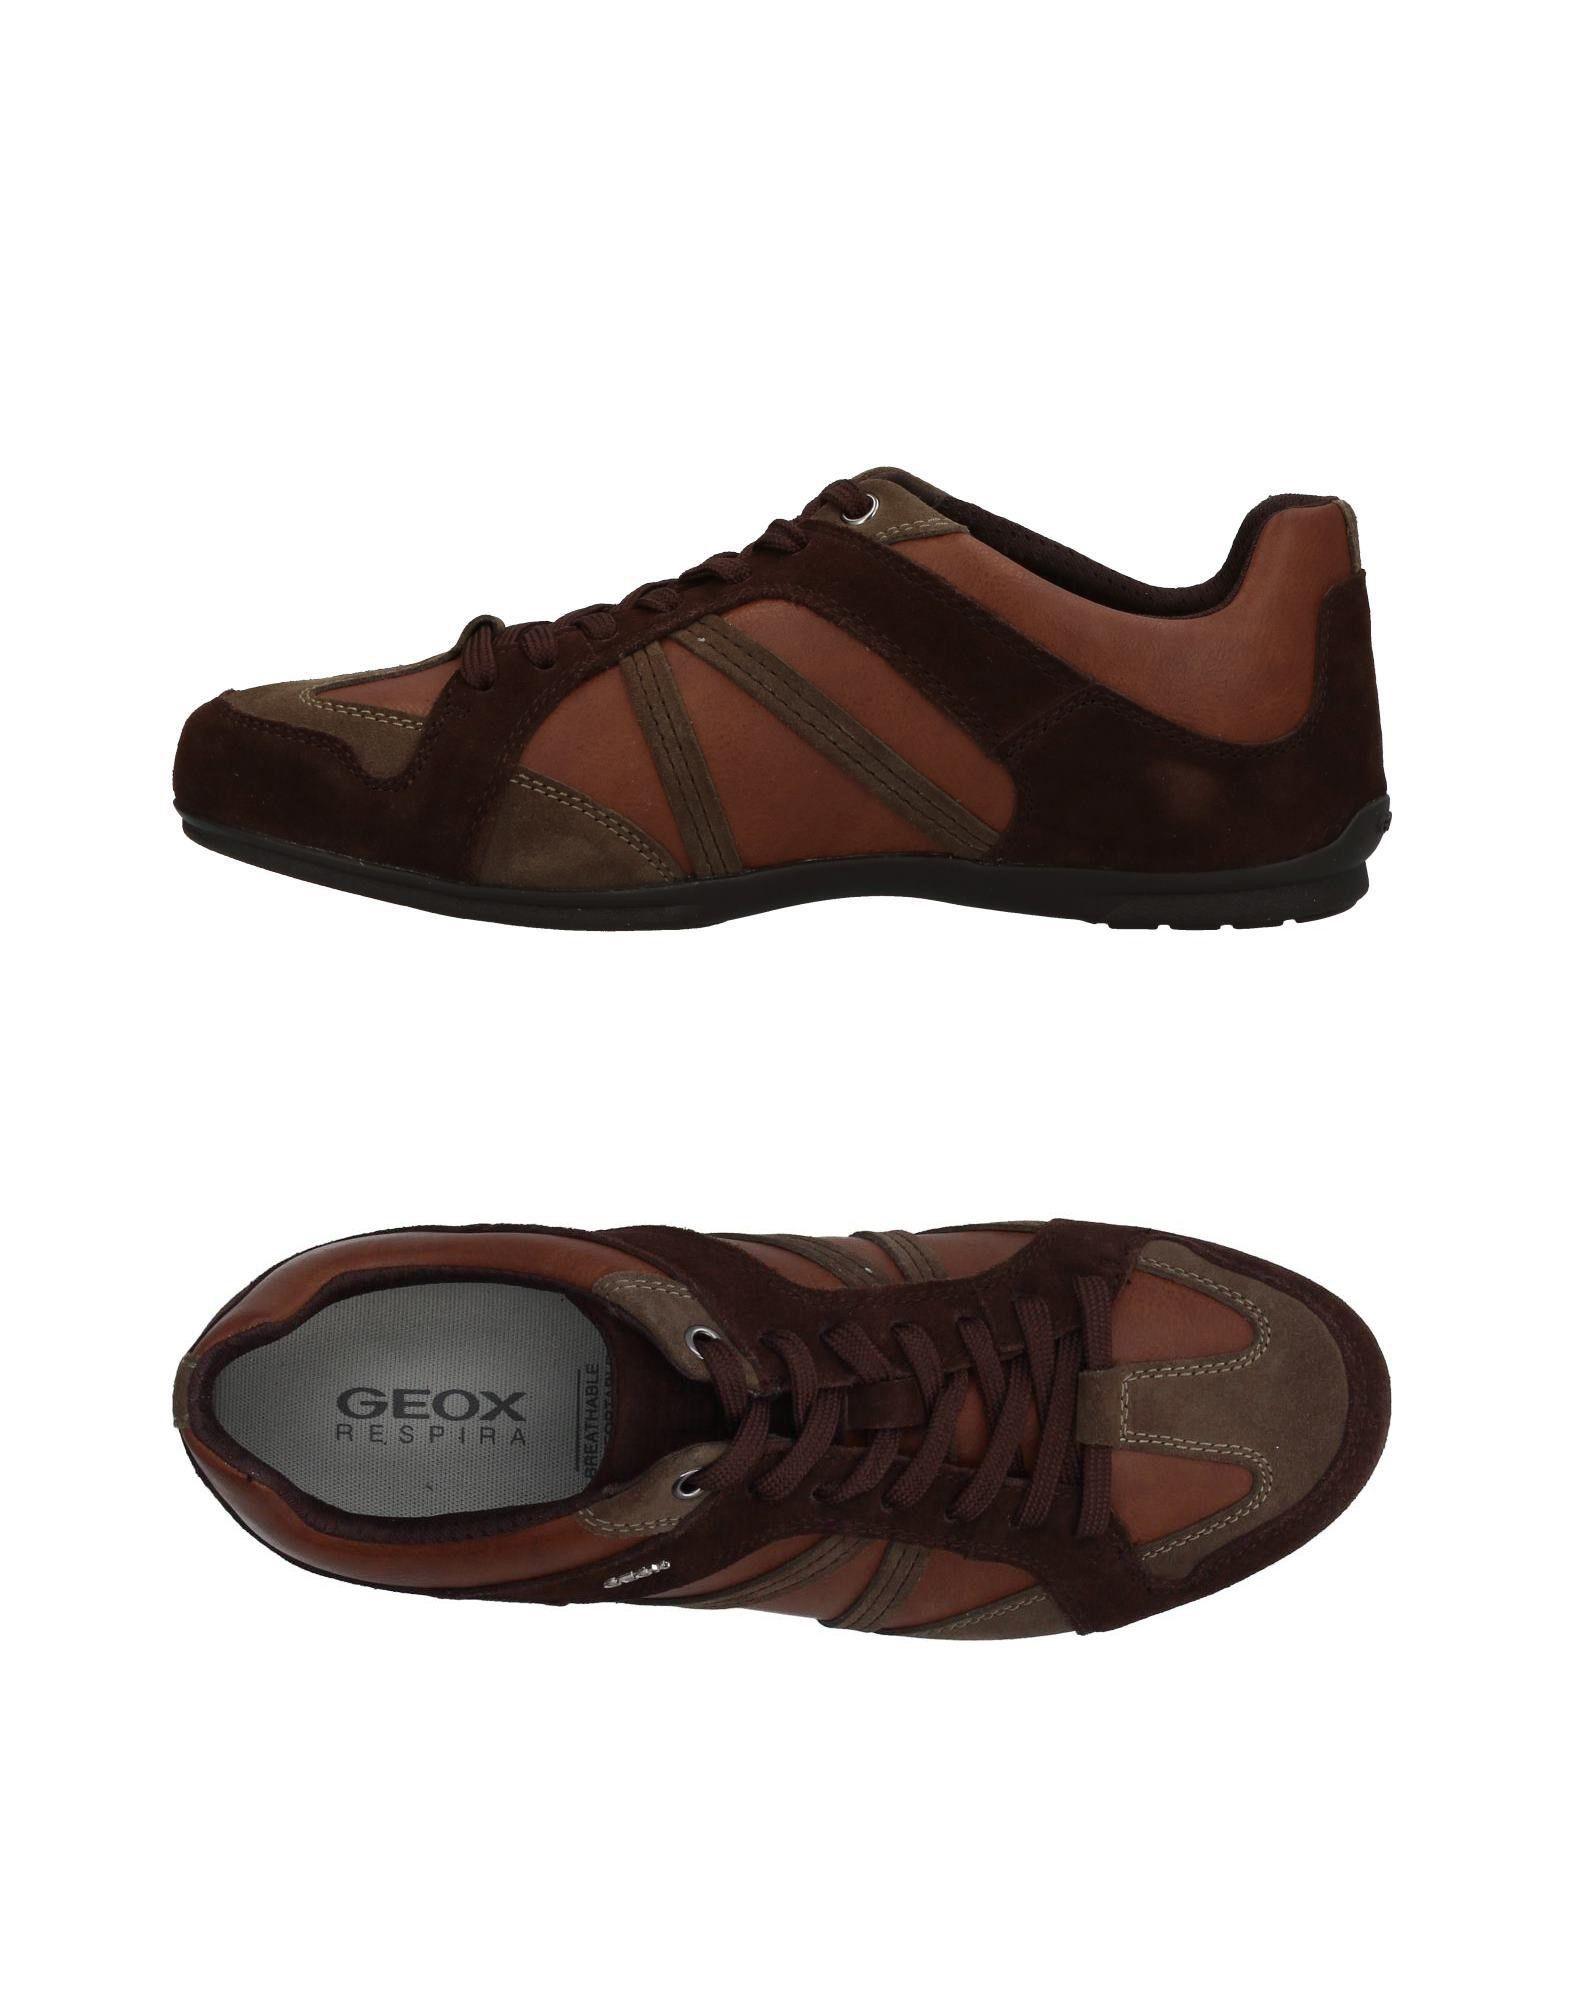 Sneakers Geox Homme - Sneakers Geox  Moka Remise de marque